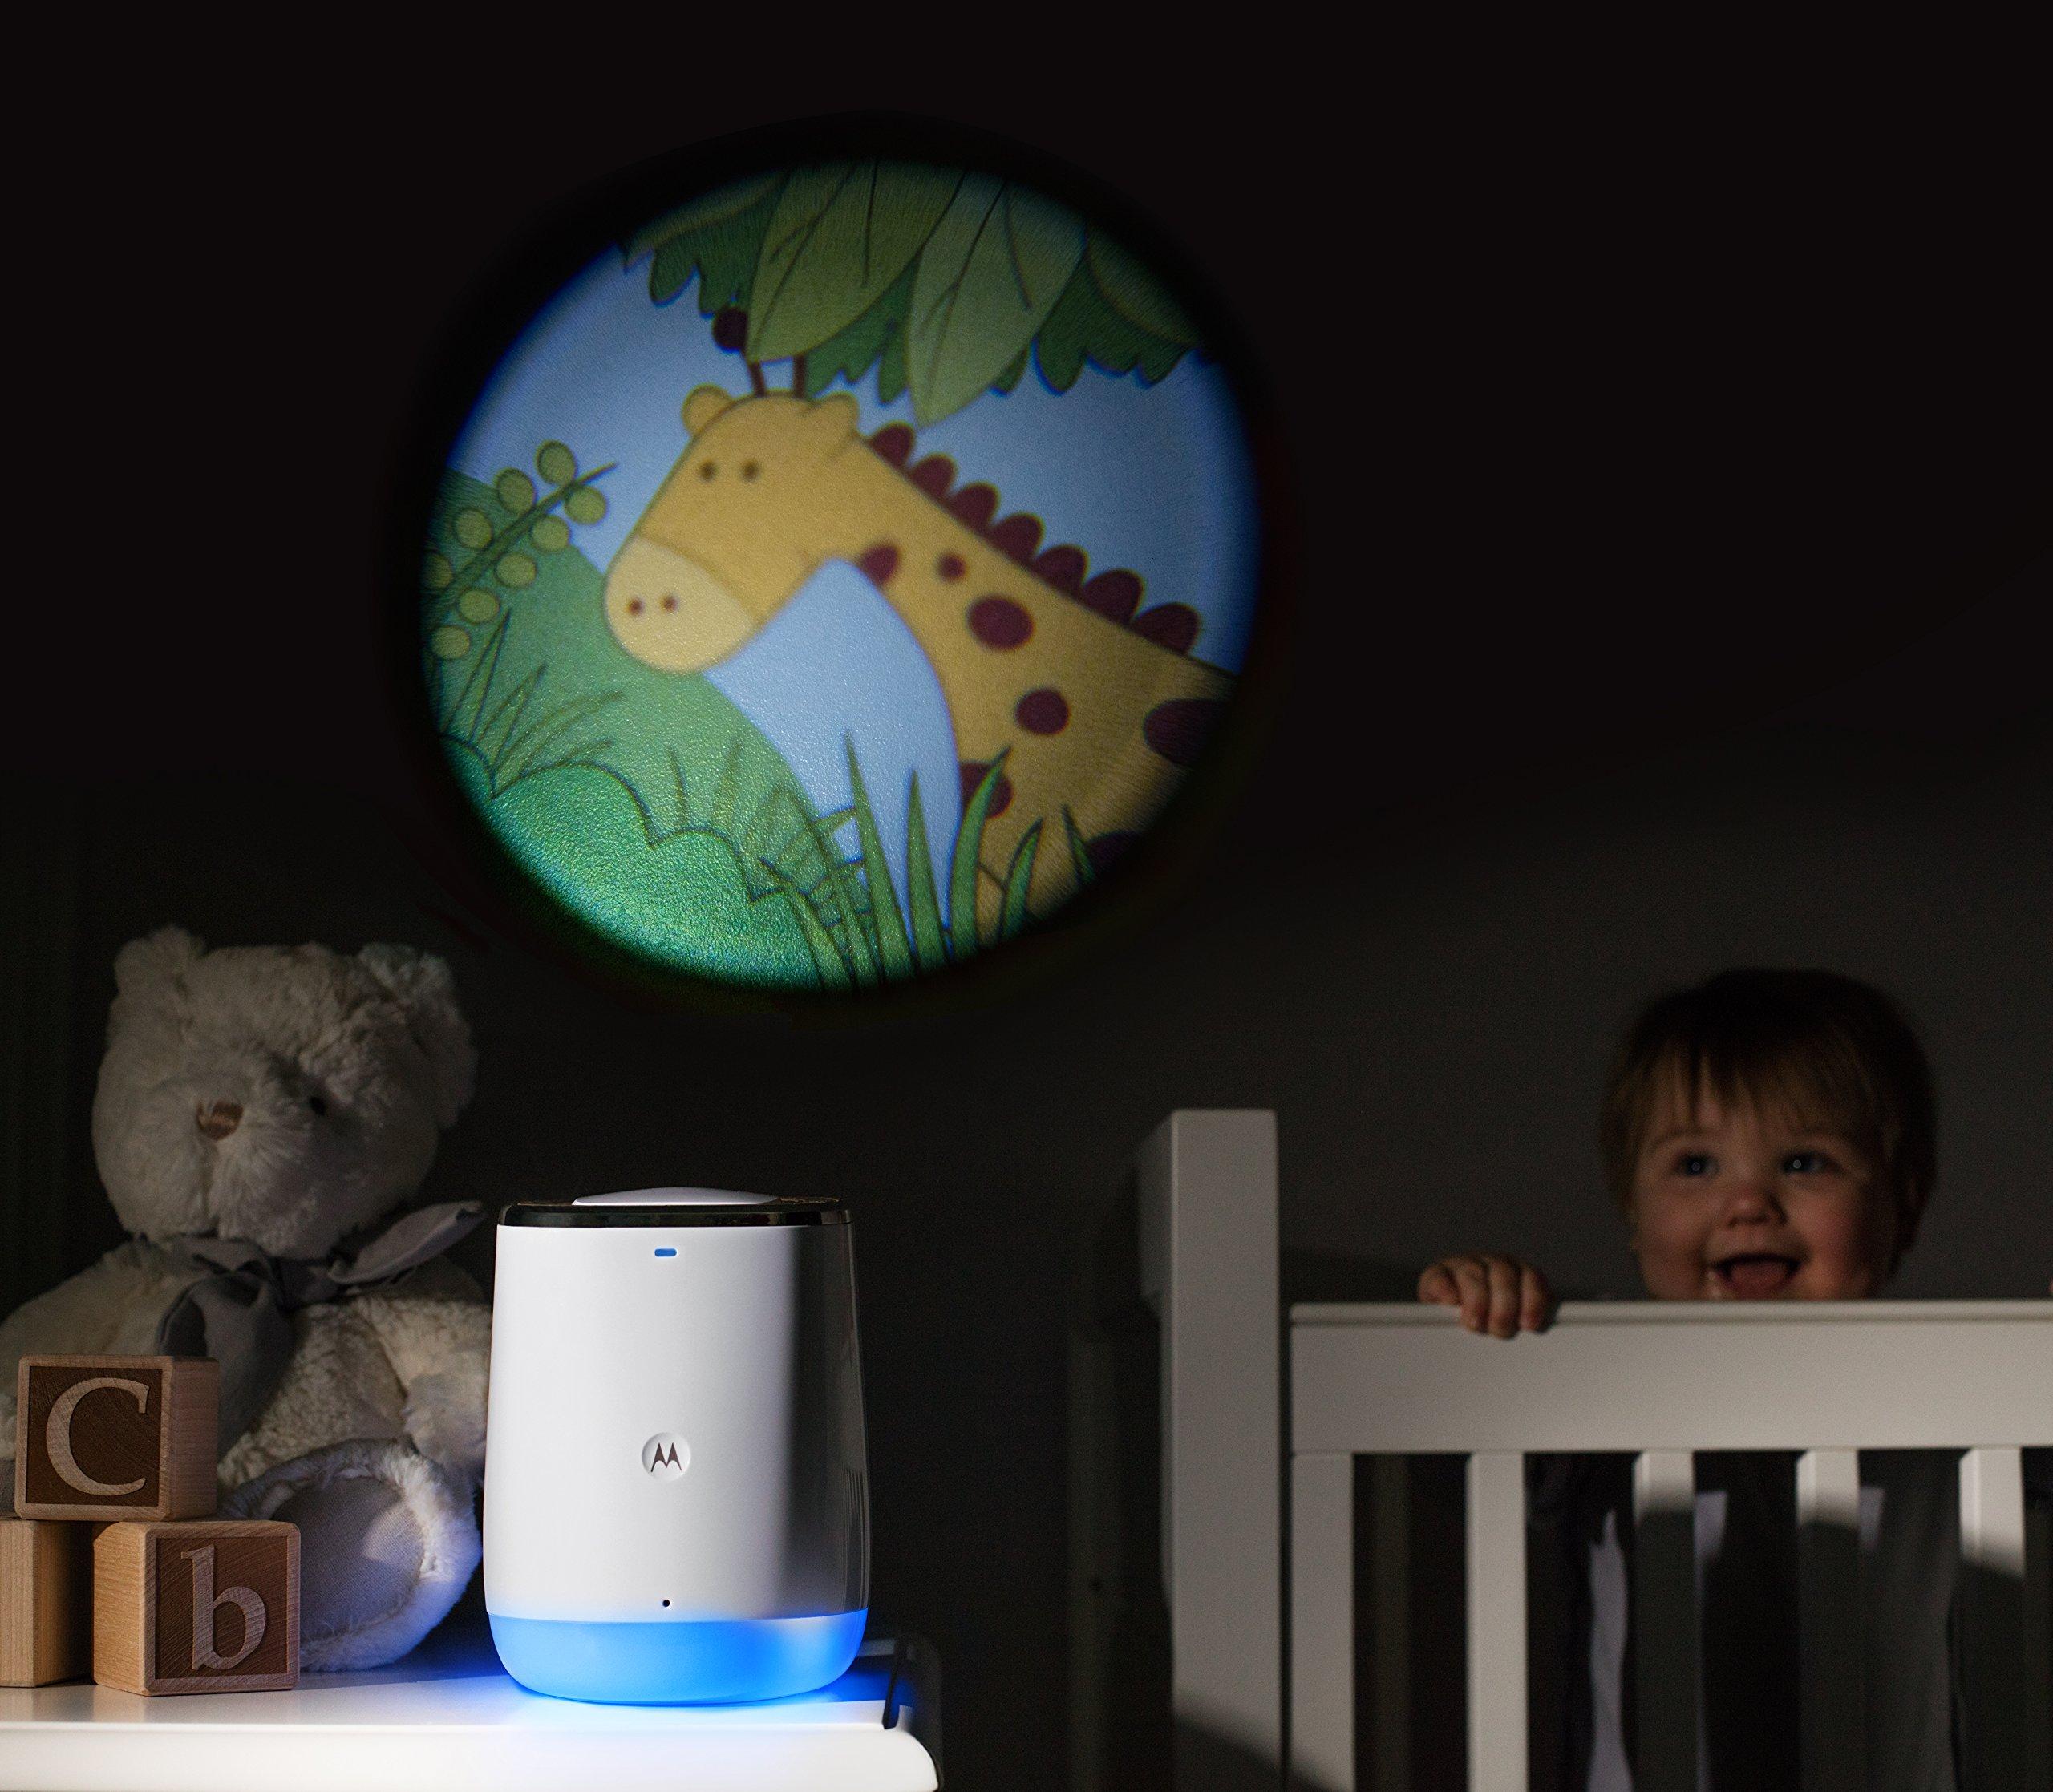 Motorola Smart Nursery Dream Machine Audio Baby Monitor with Lightshow Projector Motorola Connected audio baby monitor Lightshow projector with 3 animated scenes Night light with changeable colours 5